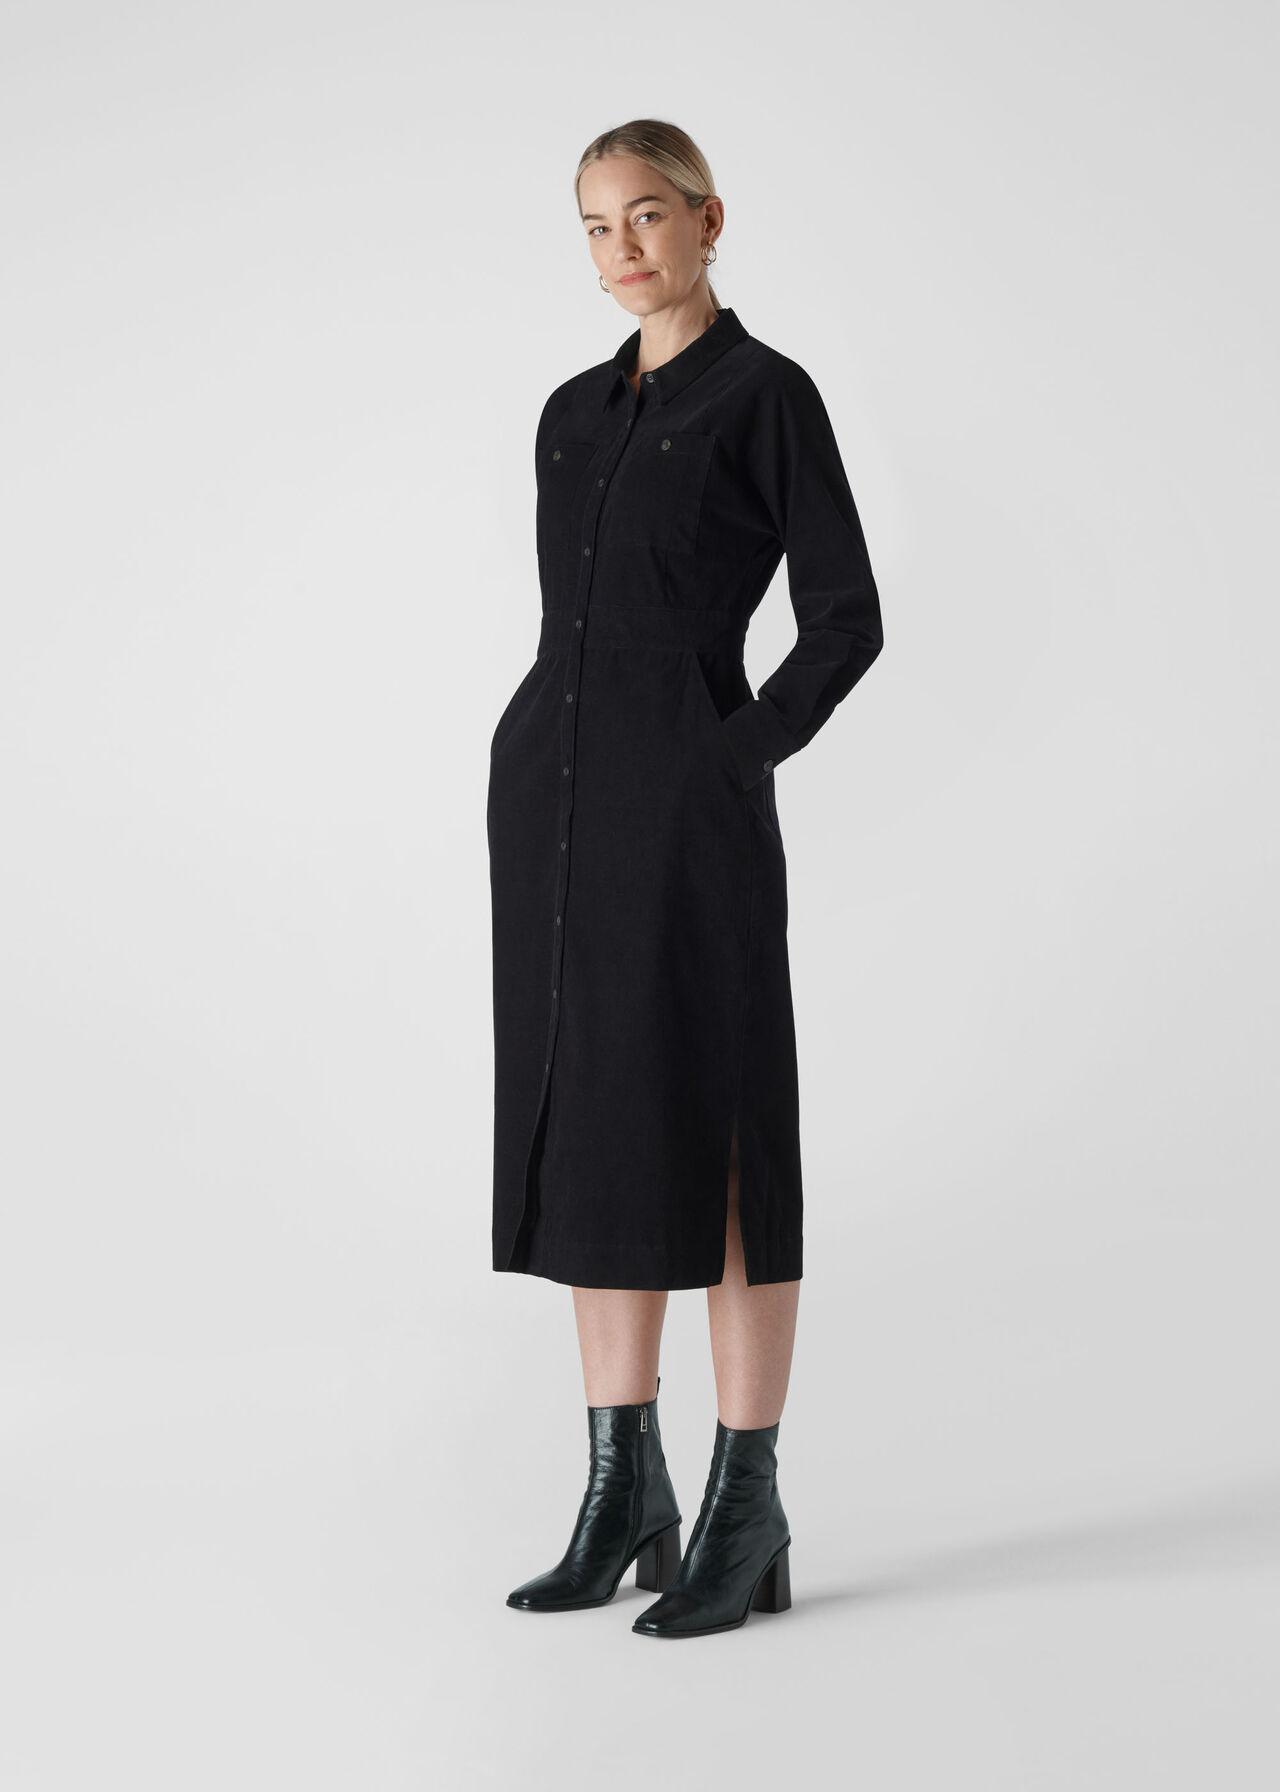 Romaine Cord Dress Black